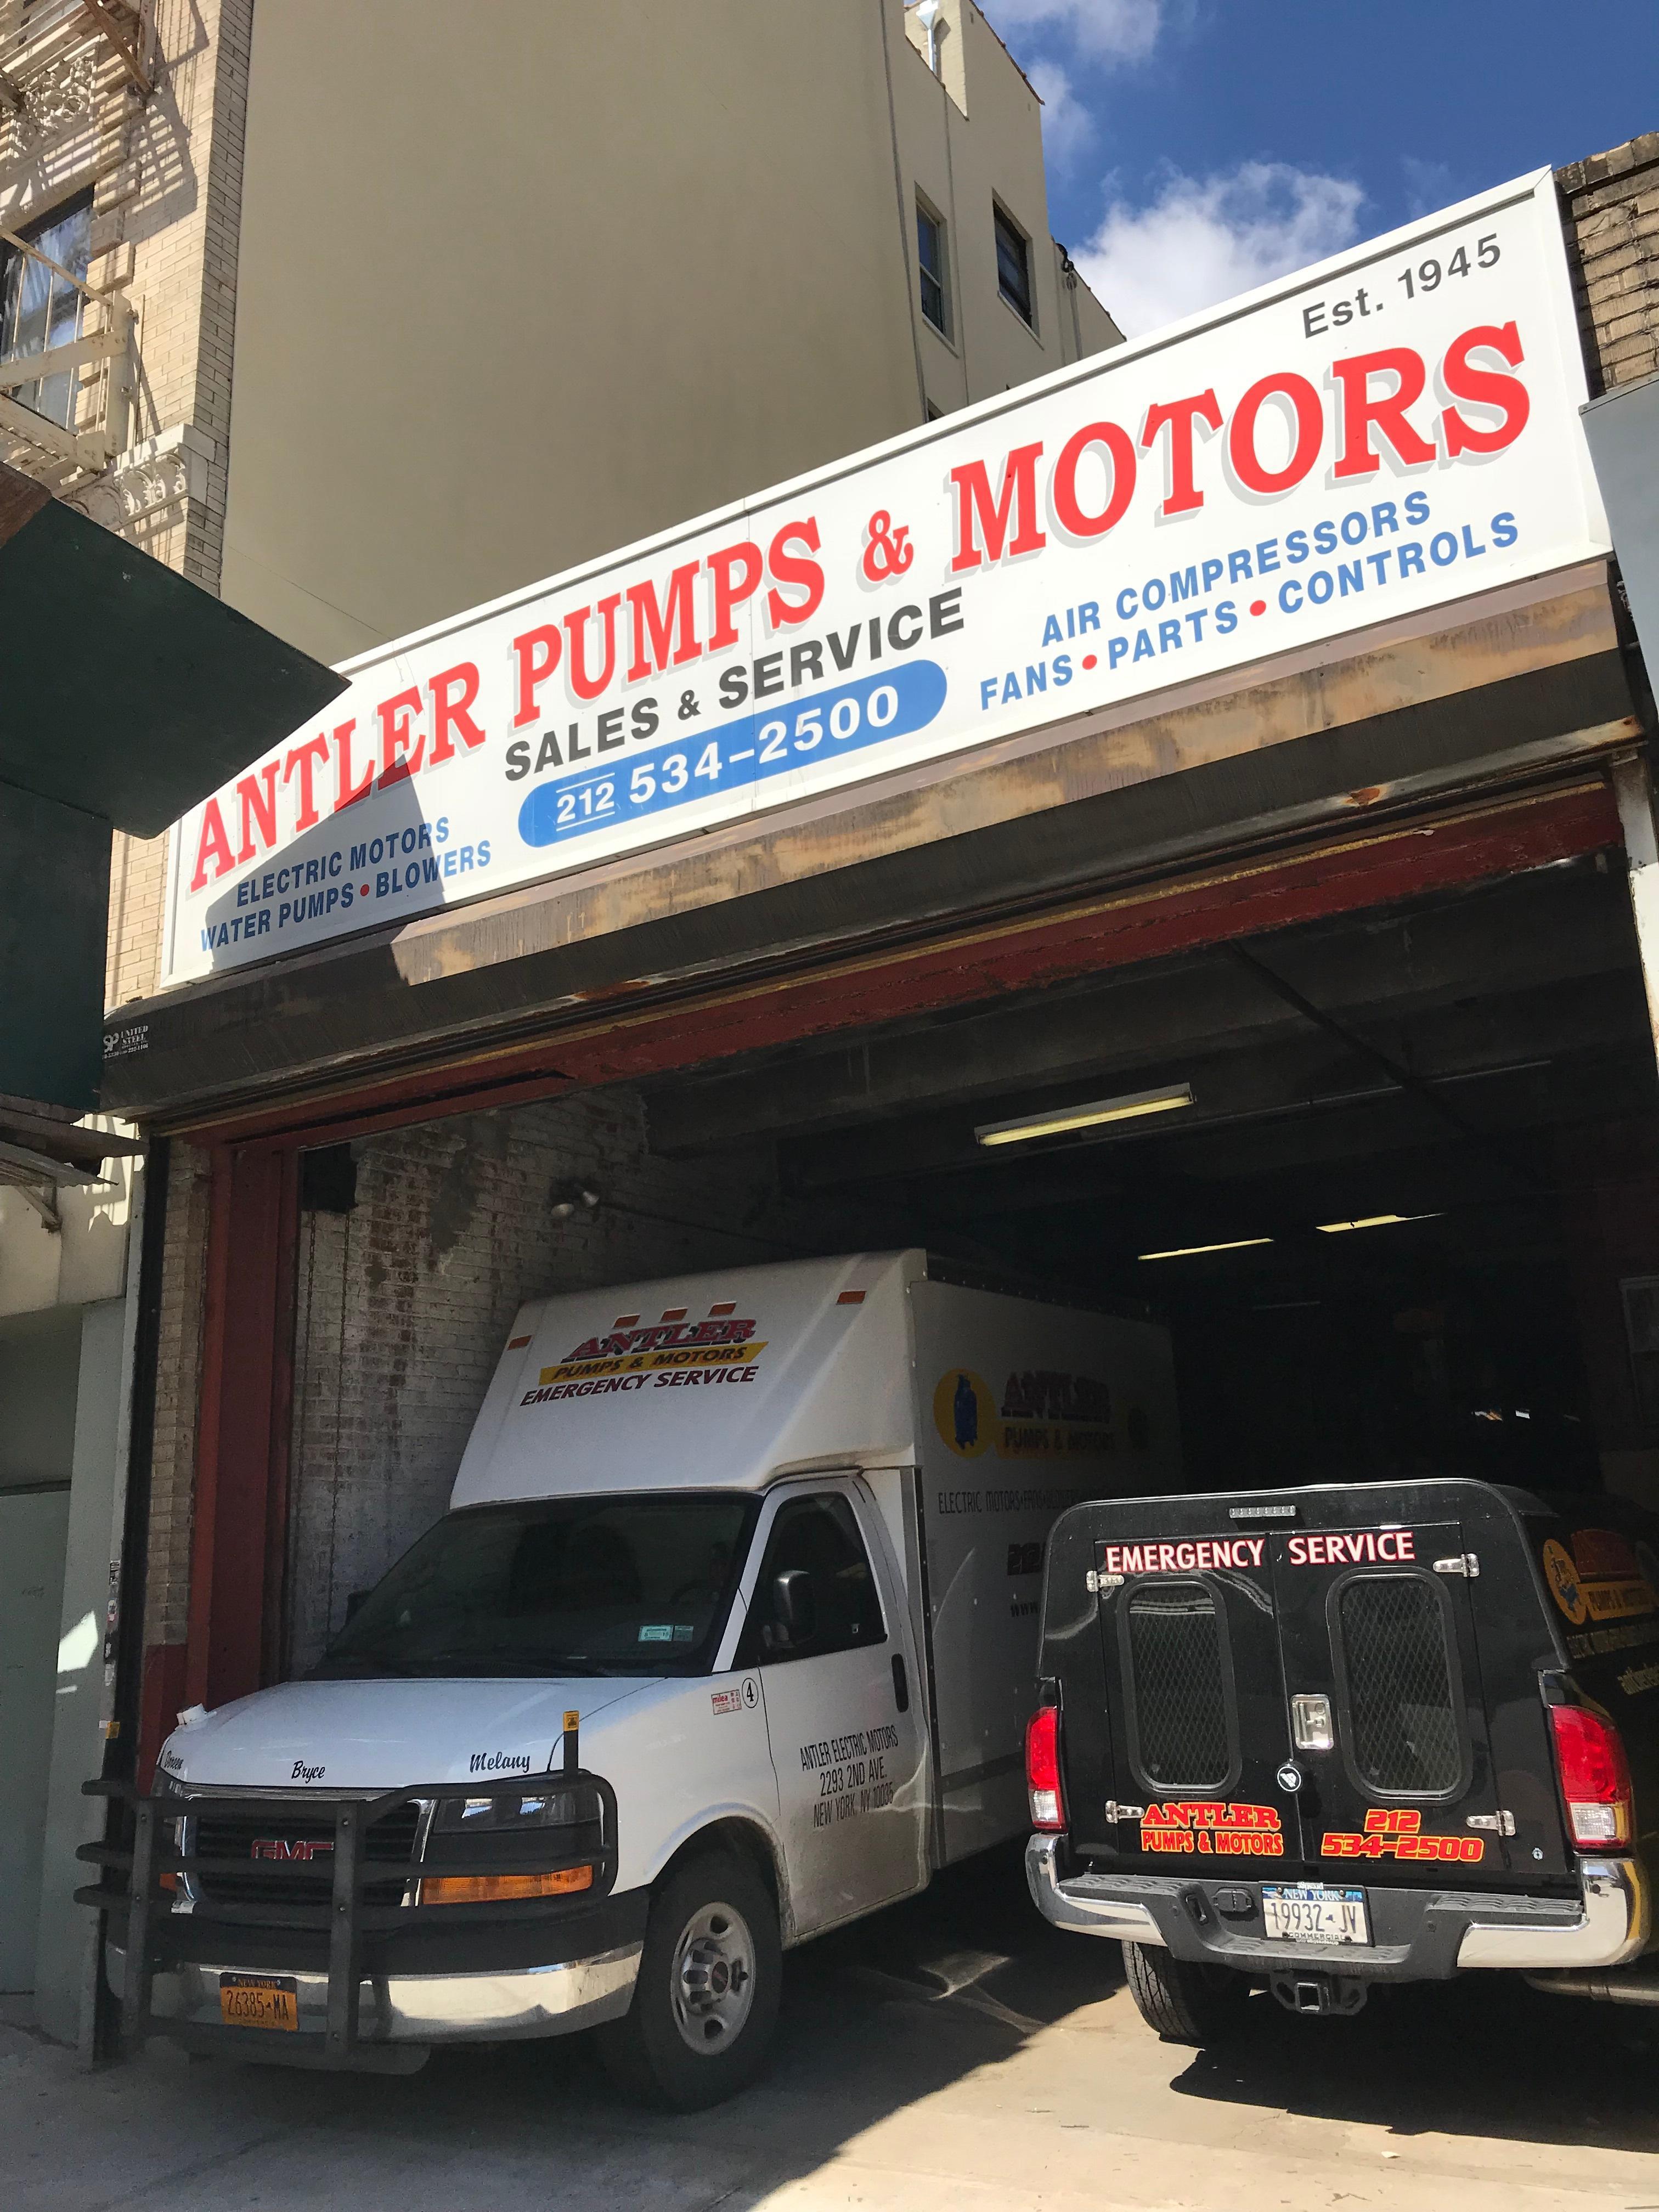 Antler Electric Motor Service Co , Inc. image 1